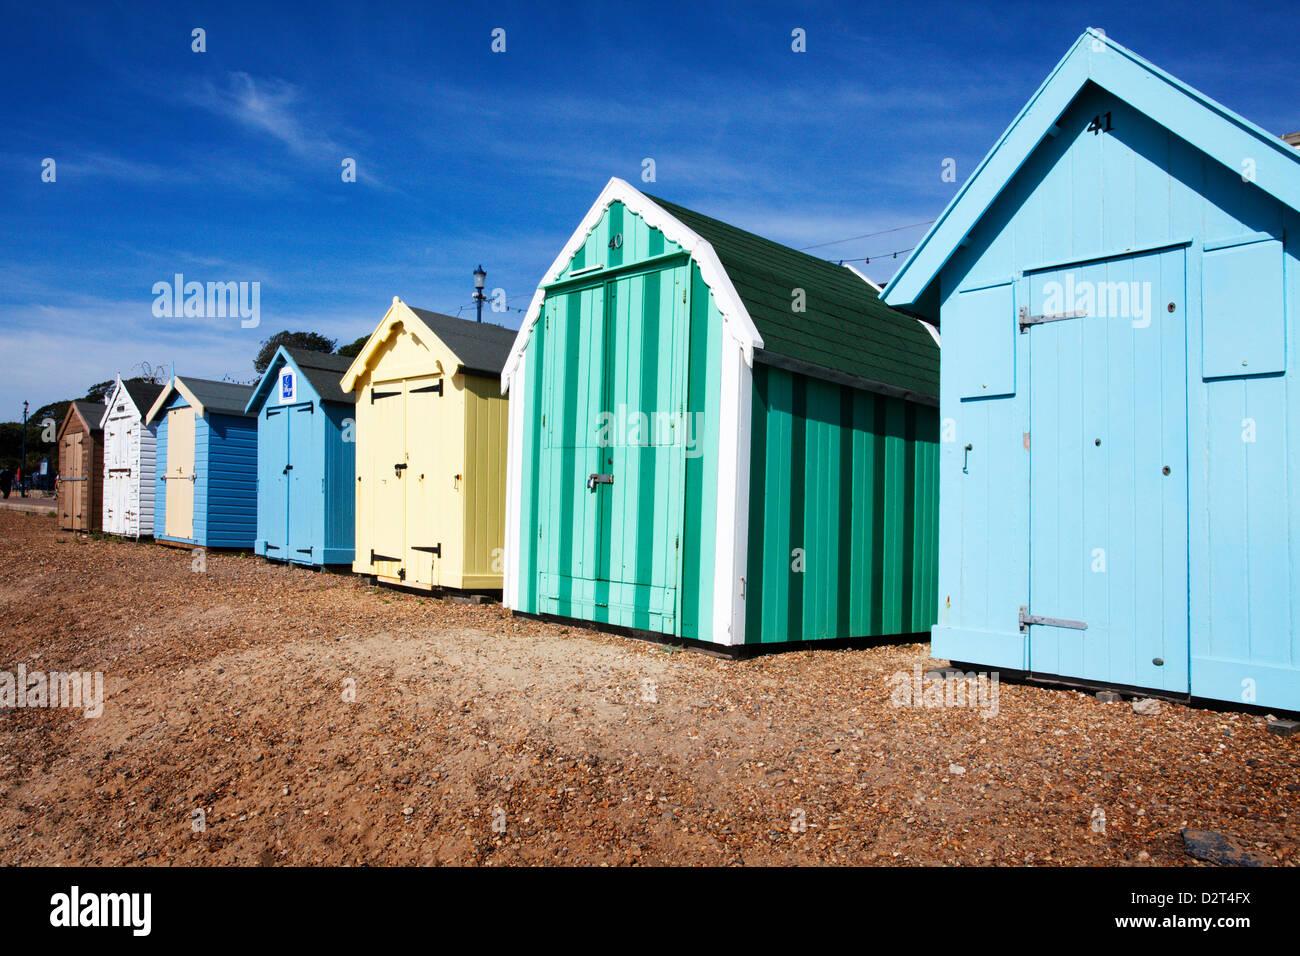 Beach huts at Felixstowe, Suffolk, England, United Kingdom, Europe - Stock Image